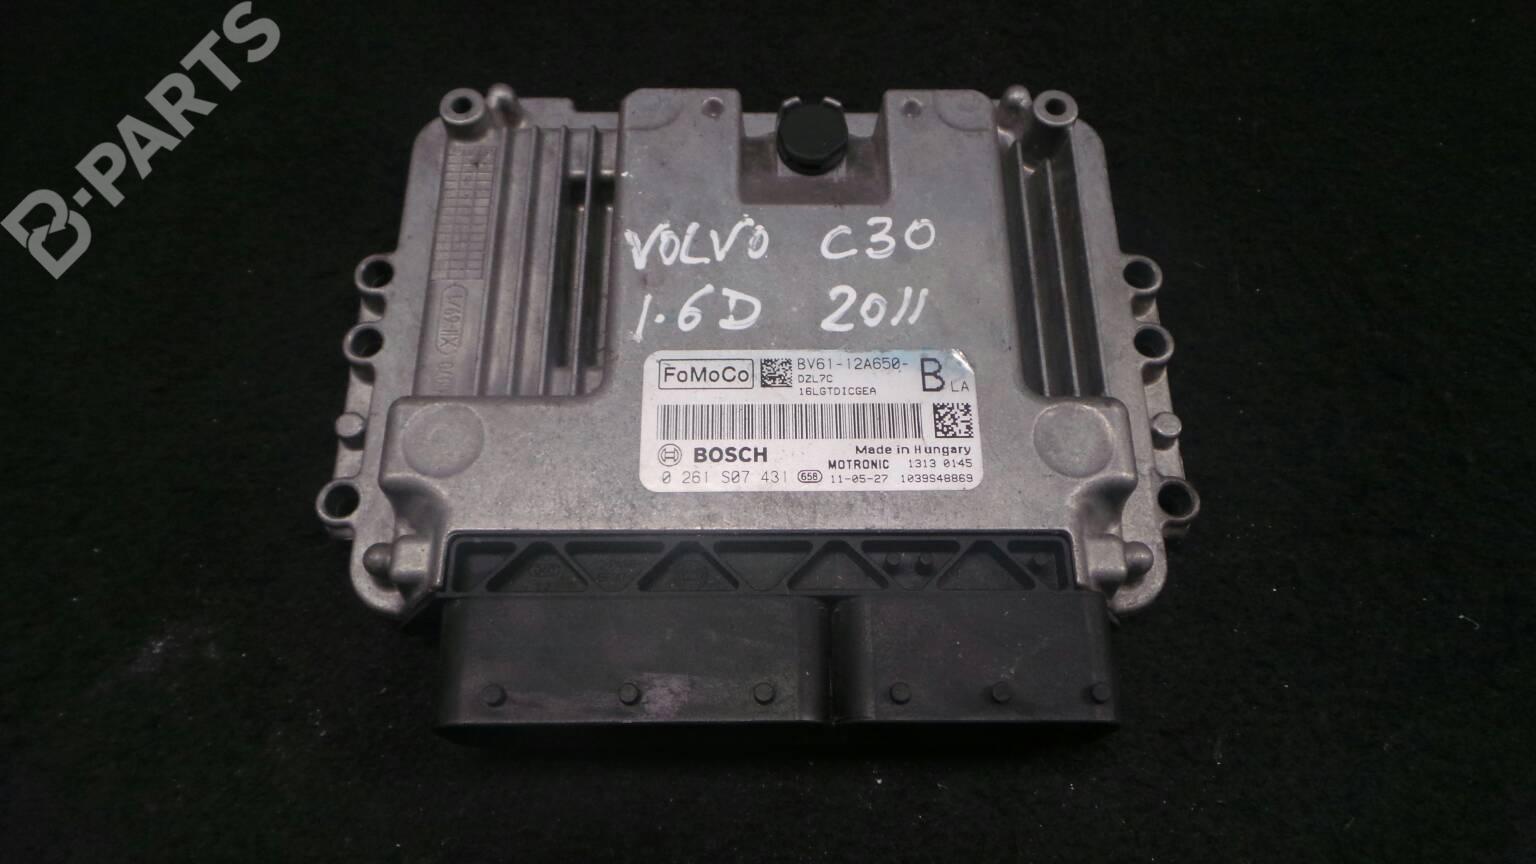 Engine Control Unit Ecu Volvo C30 533 16 D 37931 Fuse Box For 2008 Bv61 12a650 Dzl7c 0261s07431